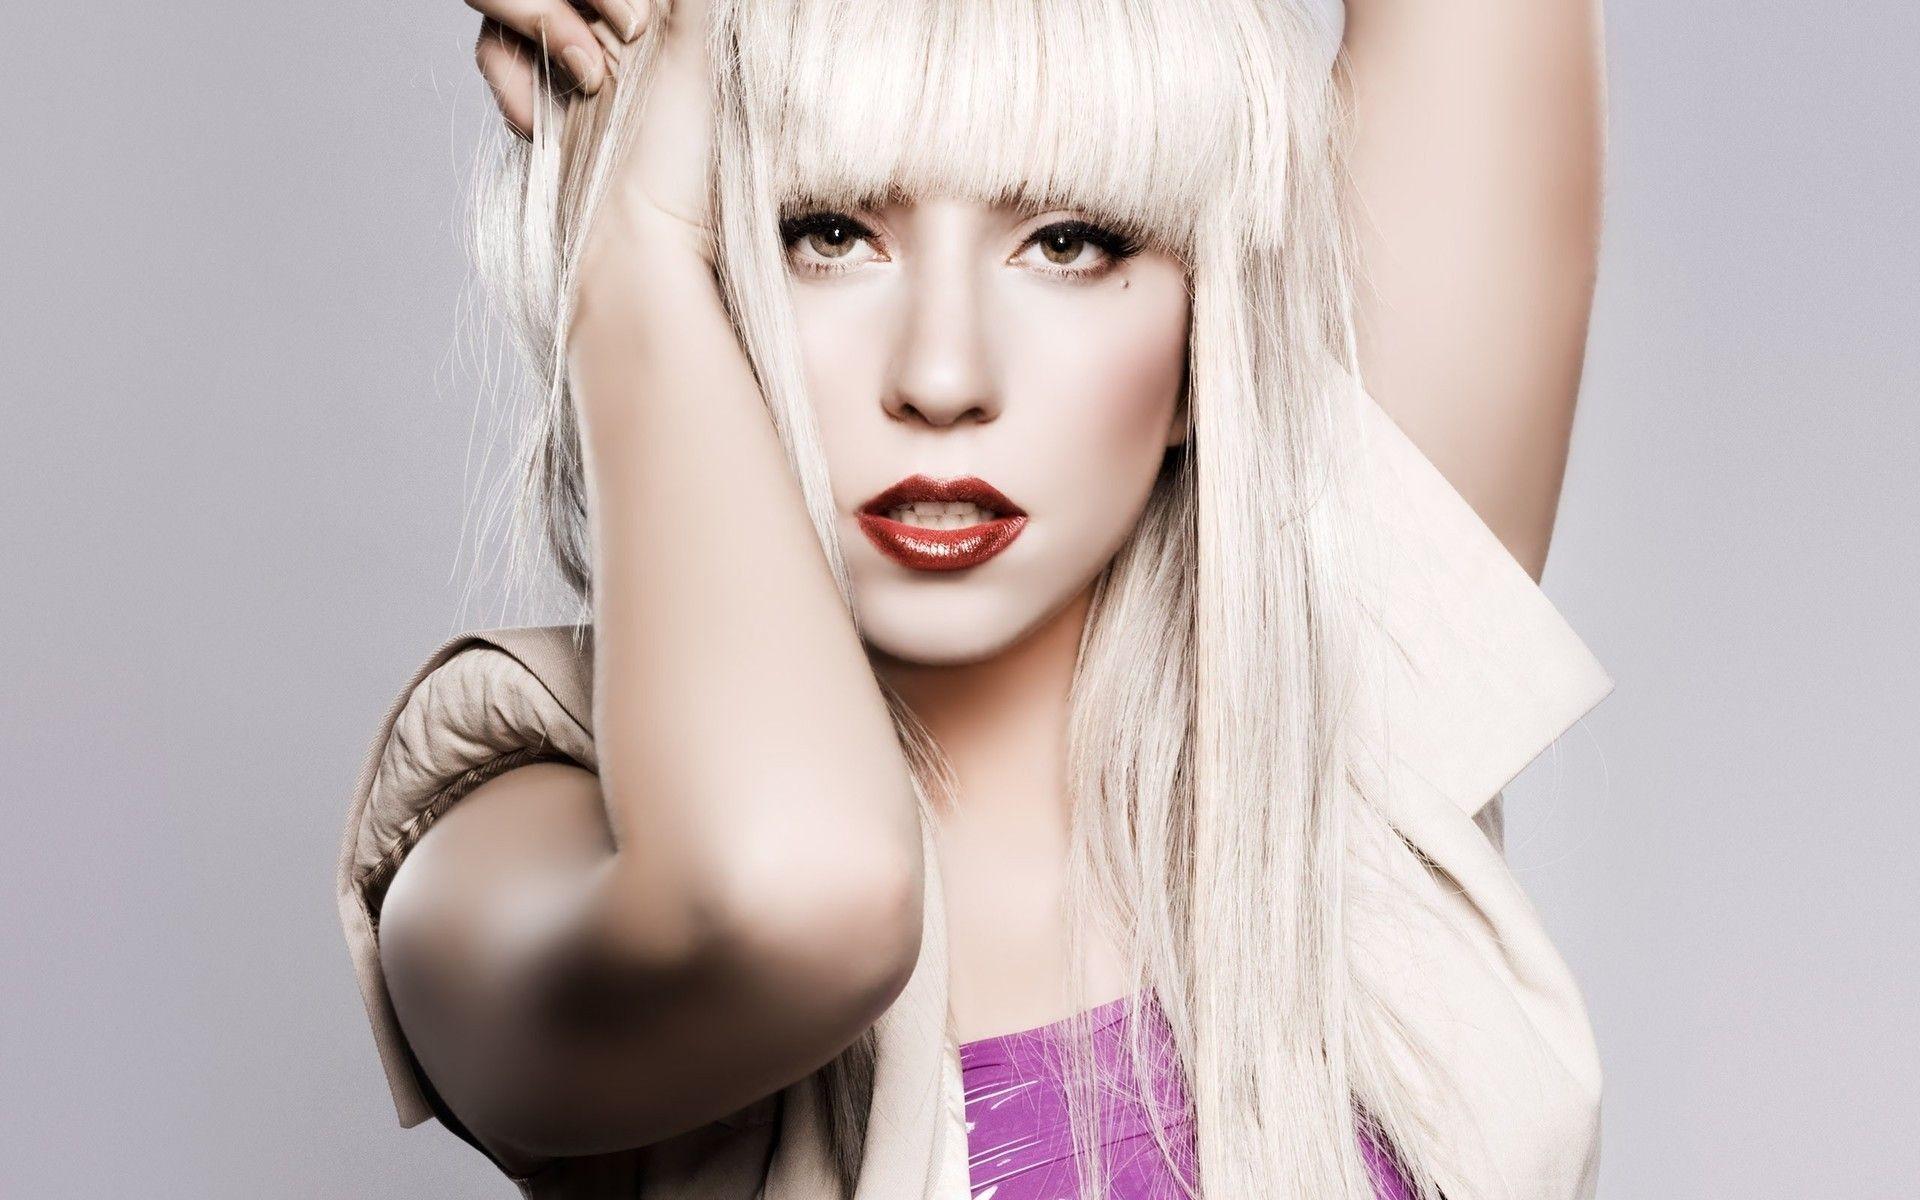 Lady Gaga Wallpaper 2018 (79+ images)